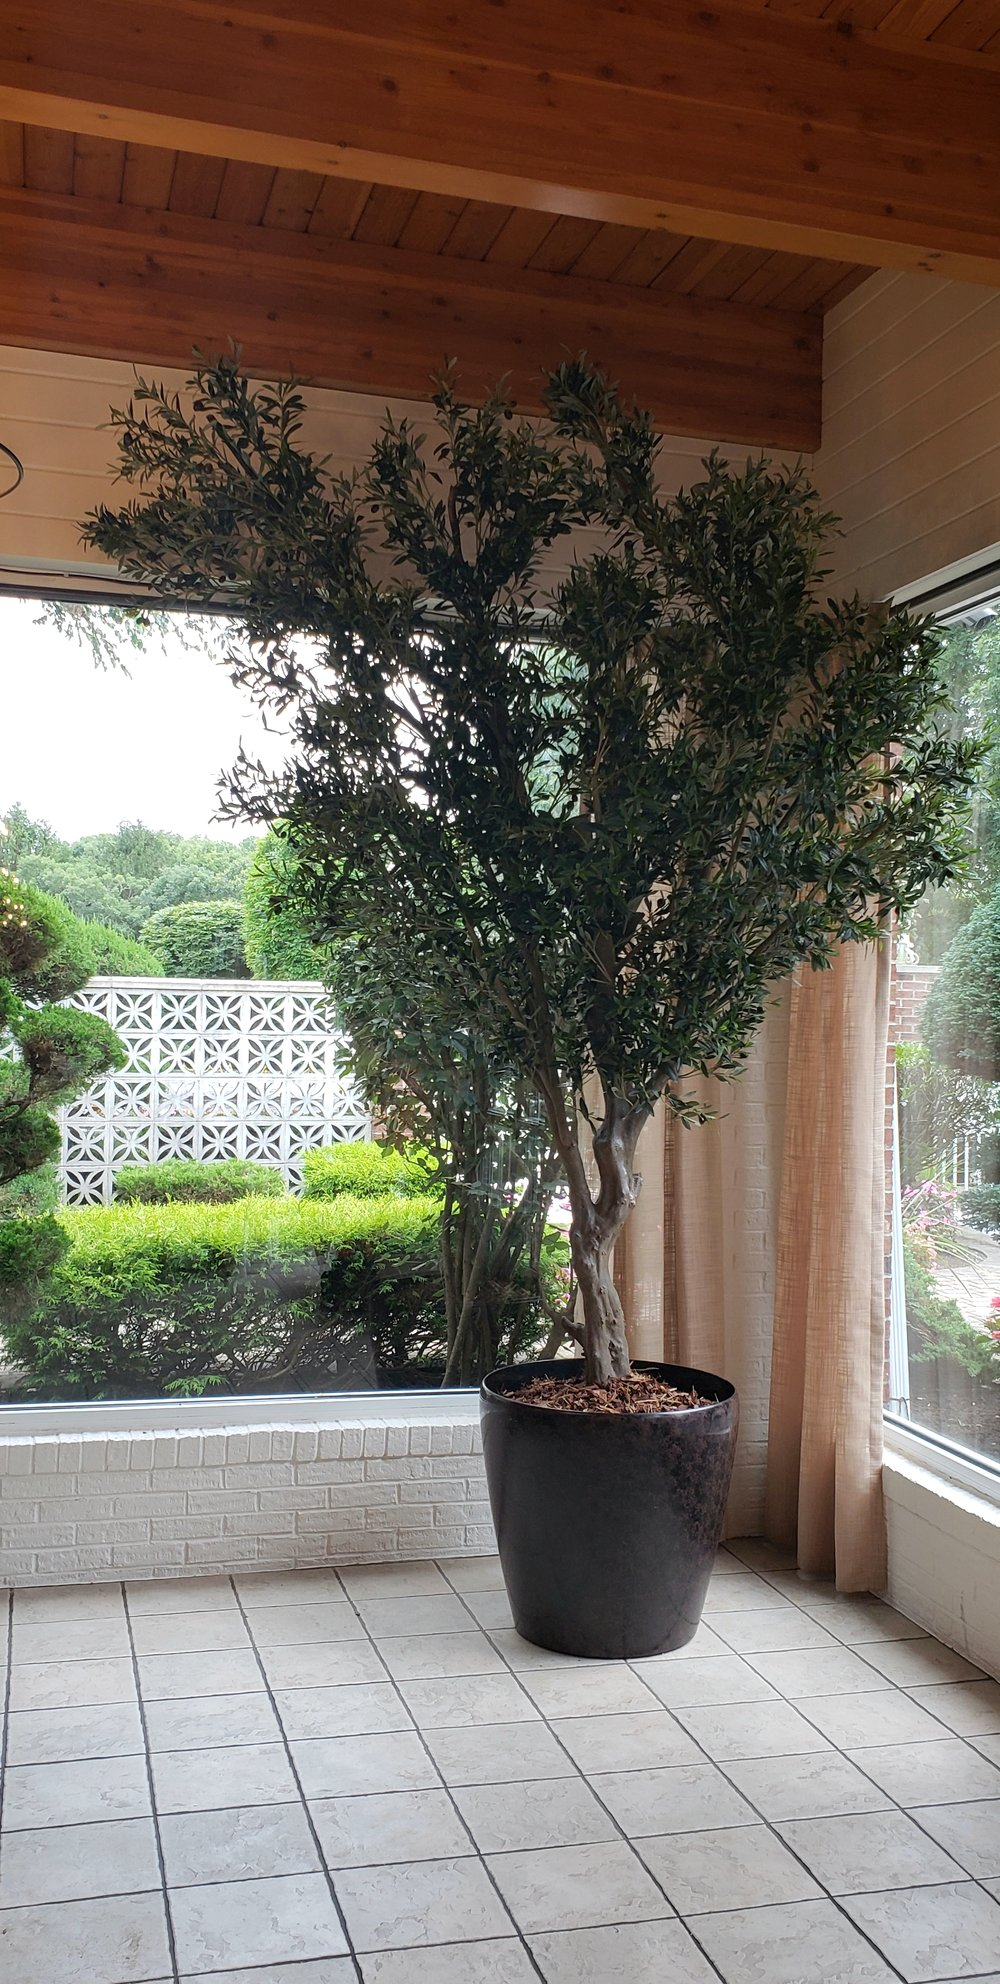 10½' Italian Olive tree with black olives